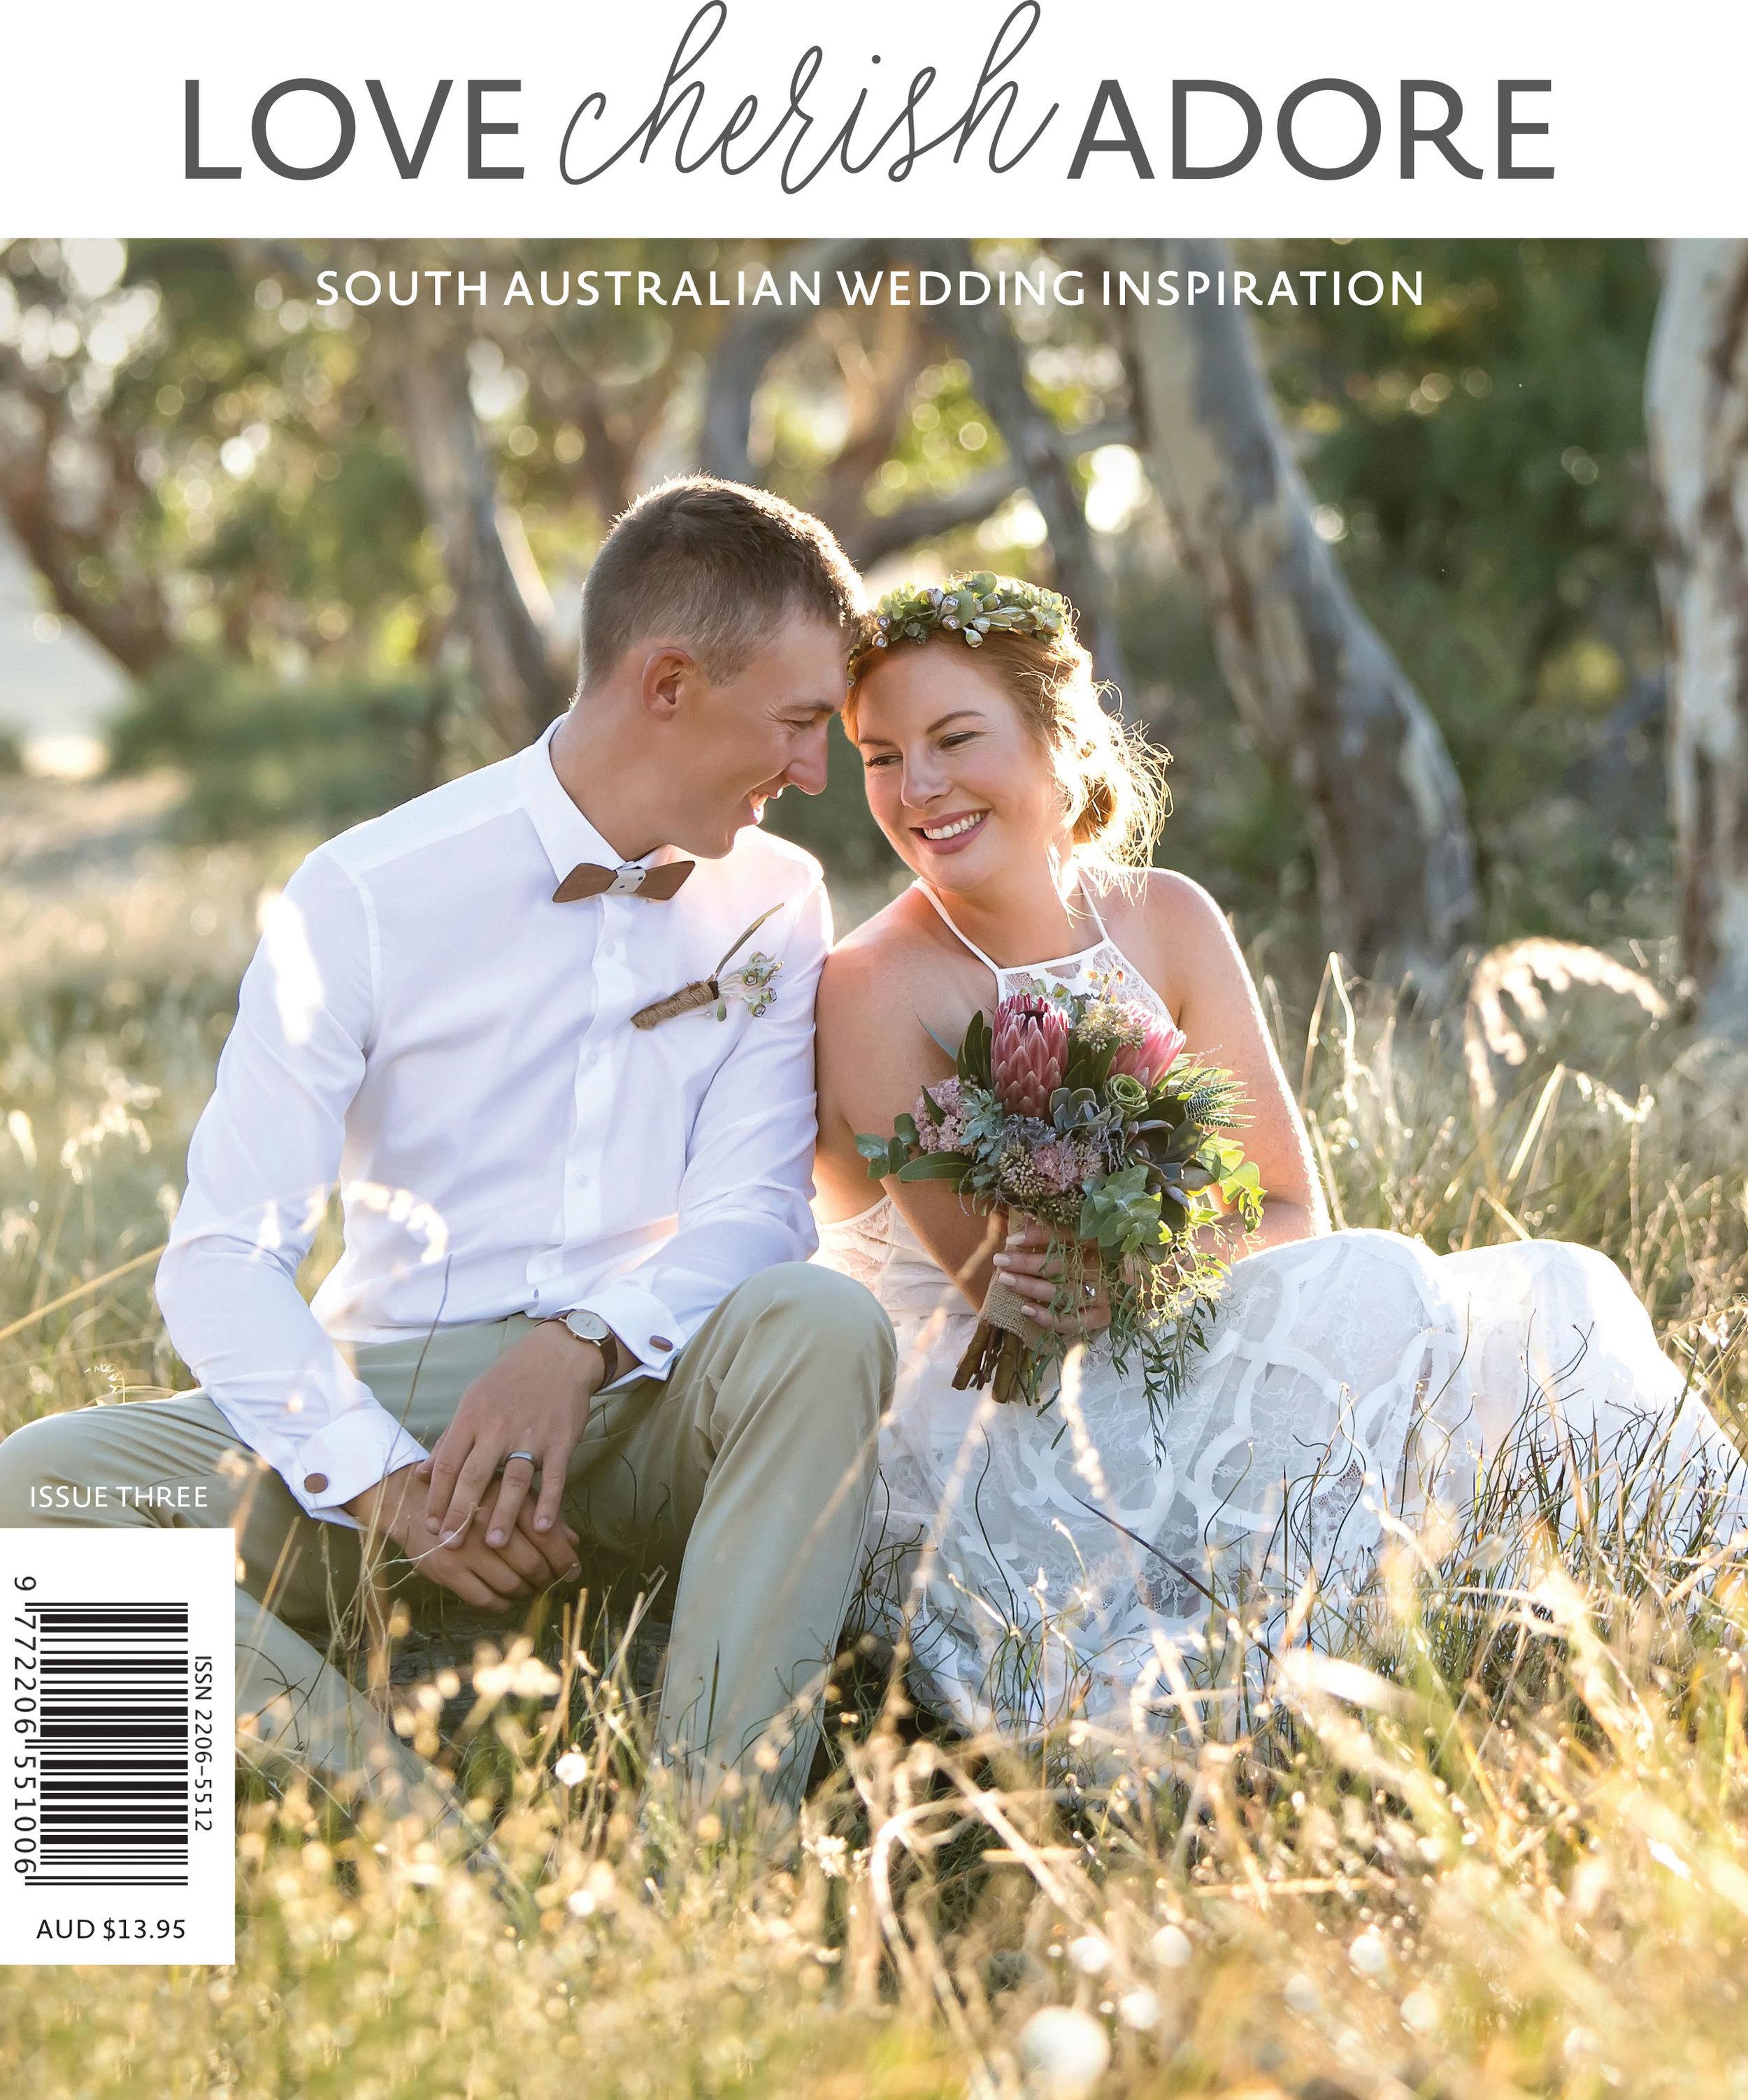 Love Cherish Adore - Issue Three